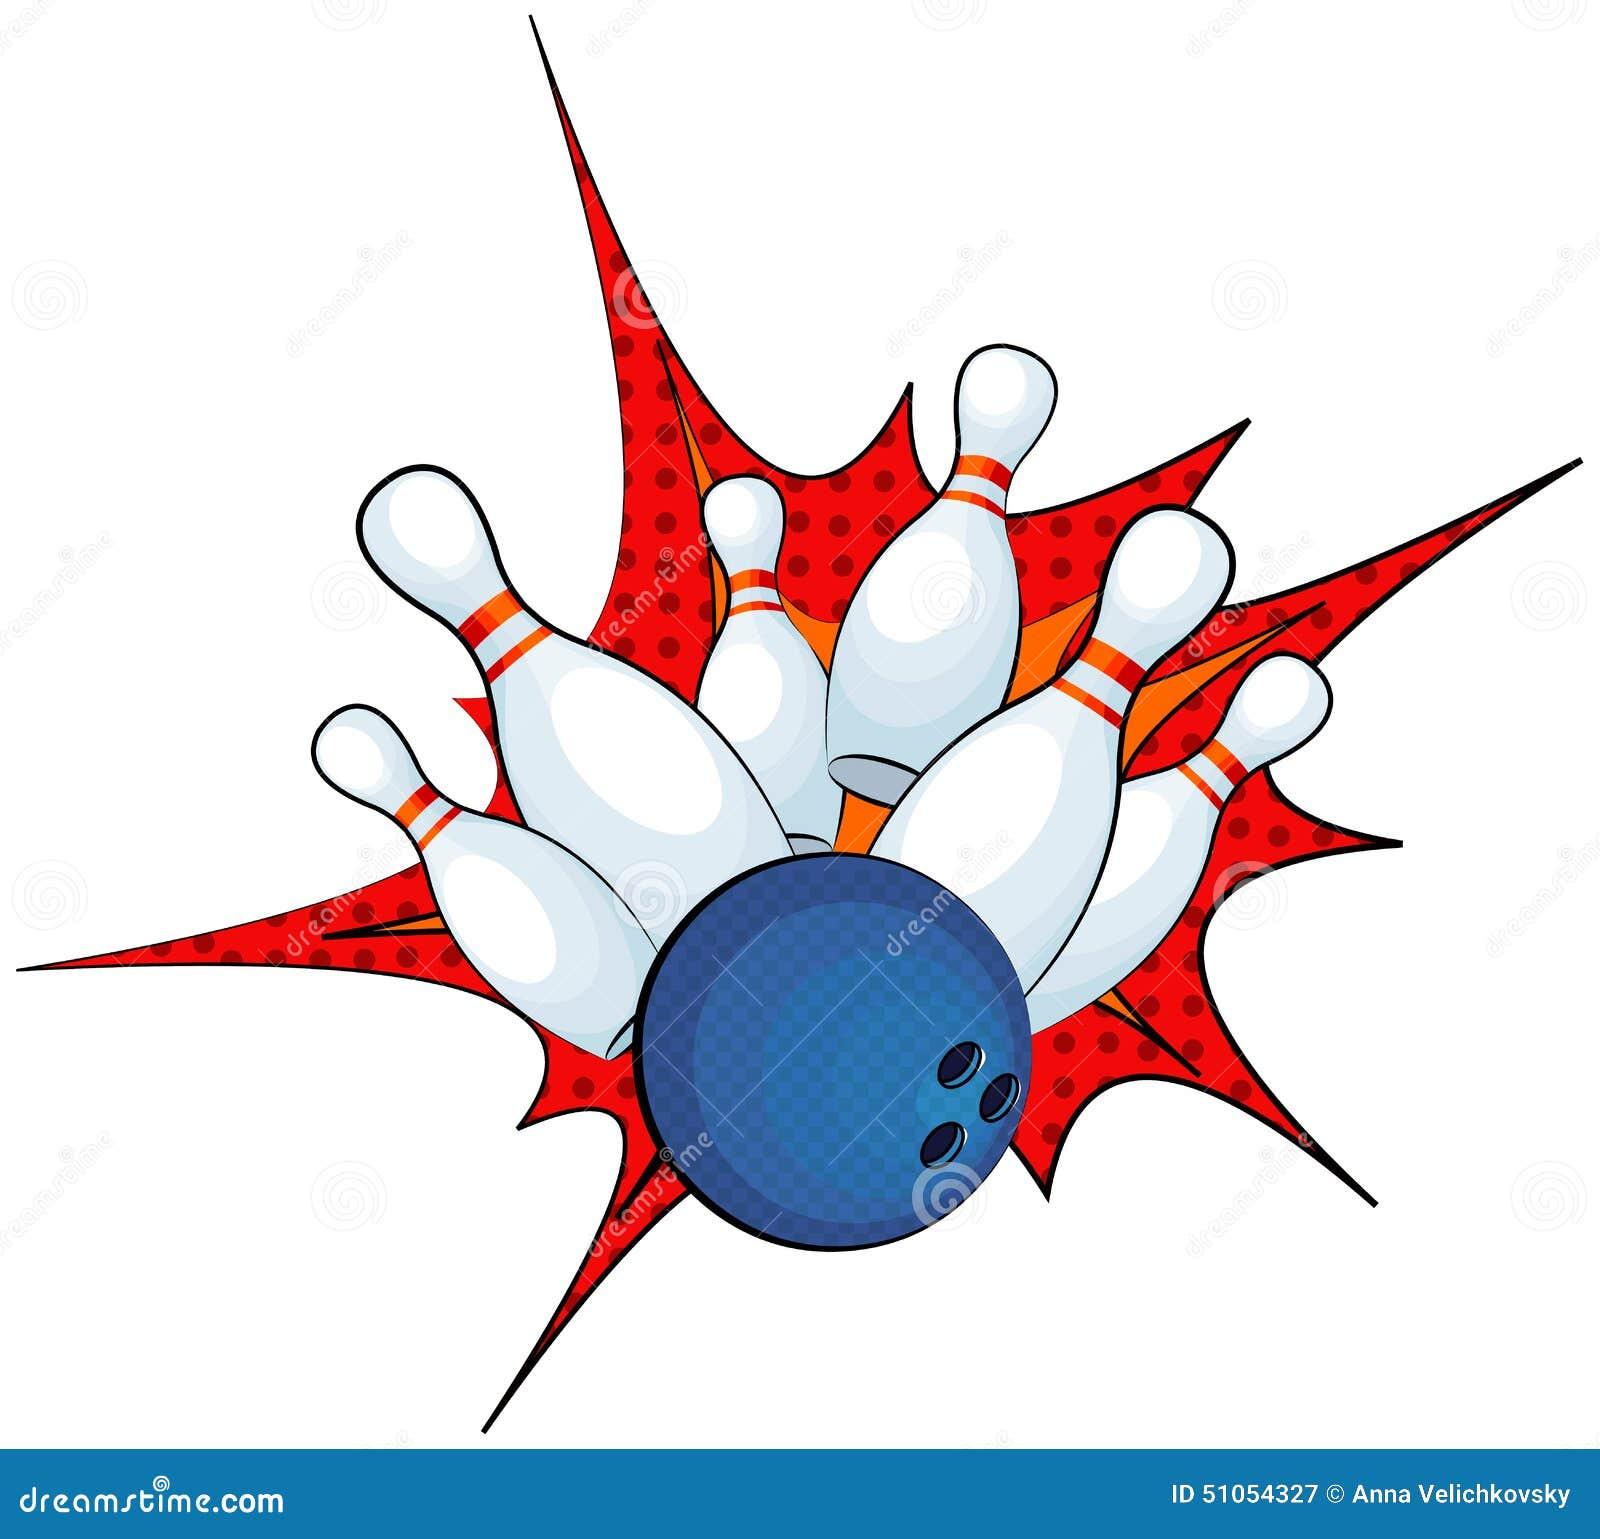 Bowling Stock Vector - Image: 51054327